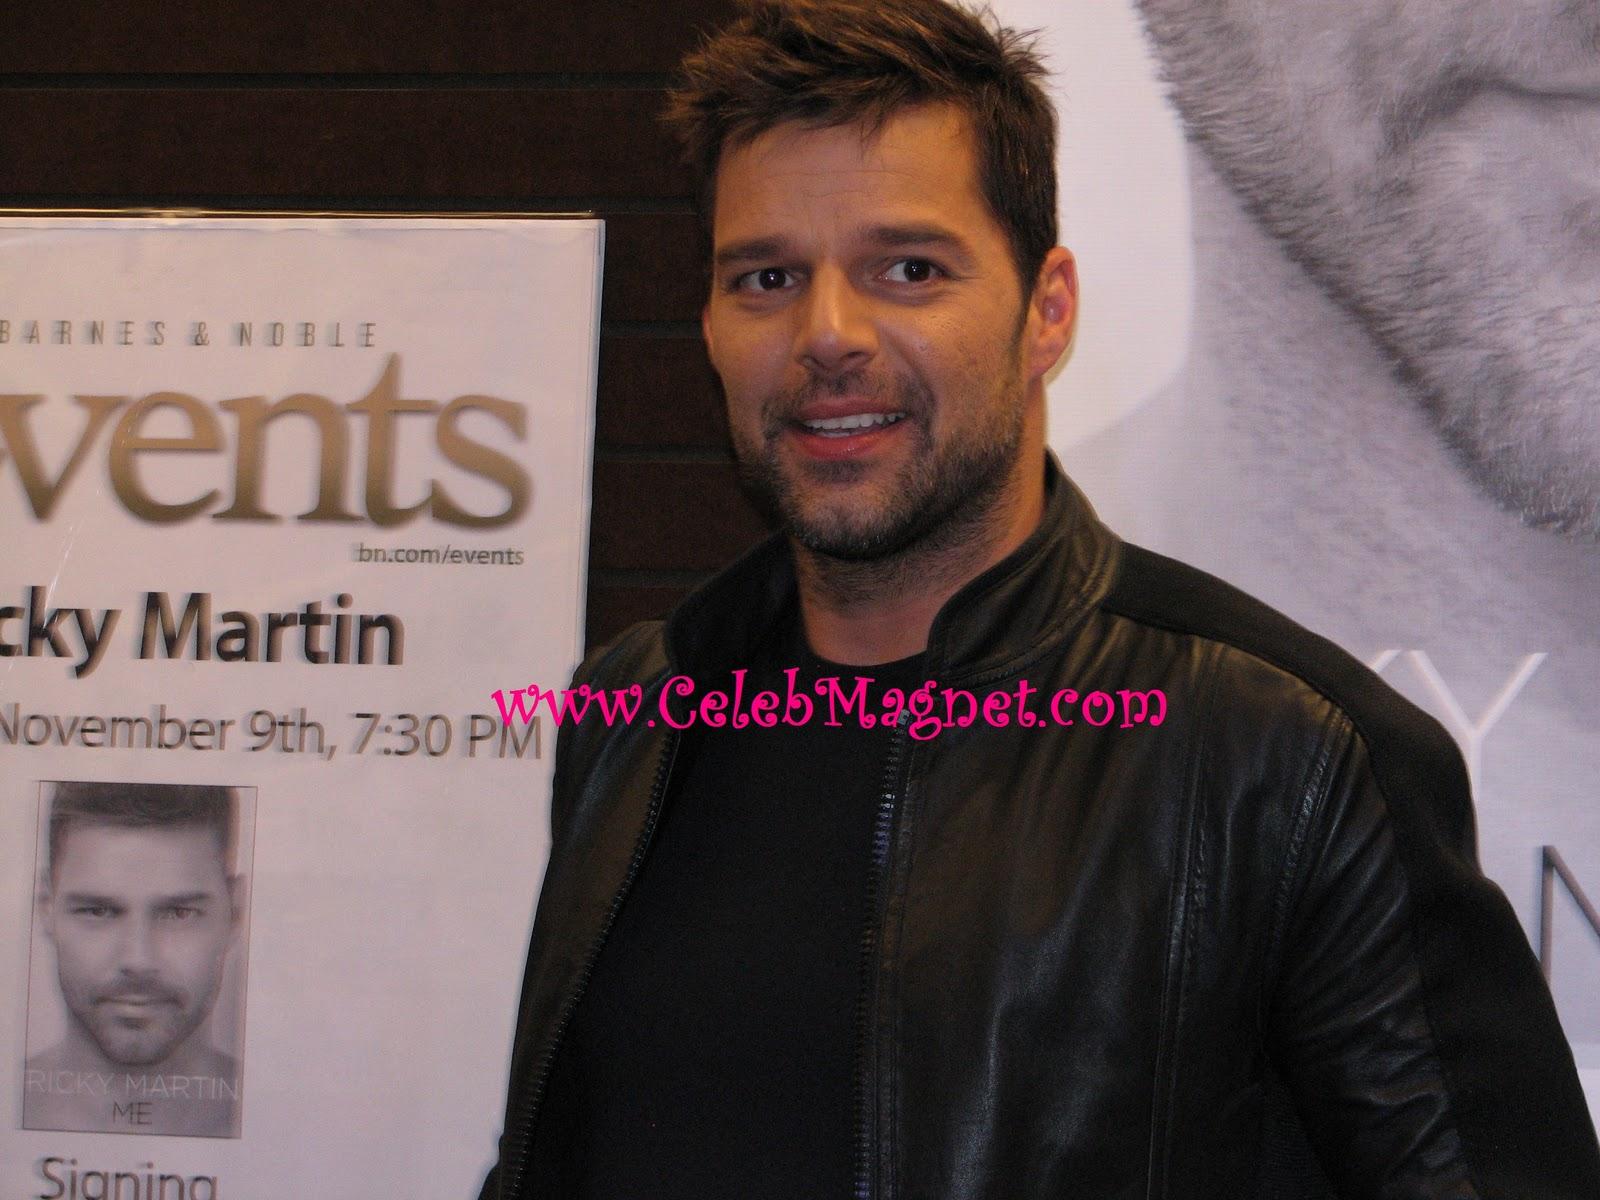 http://3.bp.blogspot.com/_LQQ5FS2UDbY/TNpEtY62R1I/AAAAAAAACxo/FCmJ0_dtqfM/s1600/Ricky+Martin+Book+Signing+Grove+3.jpg